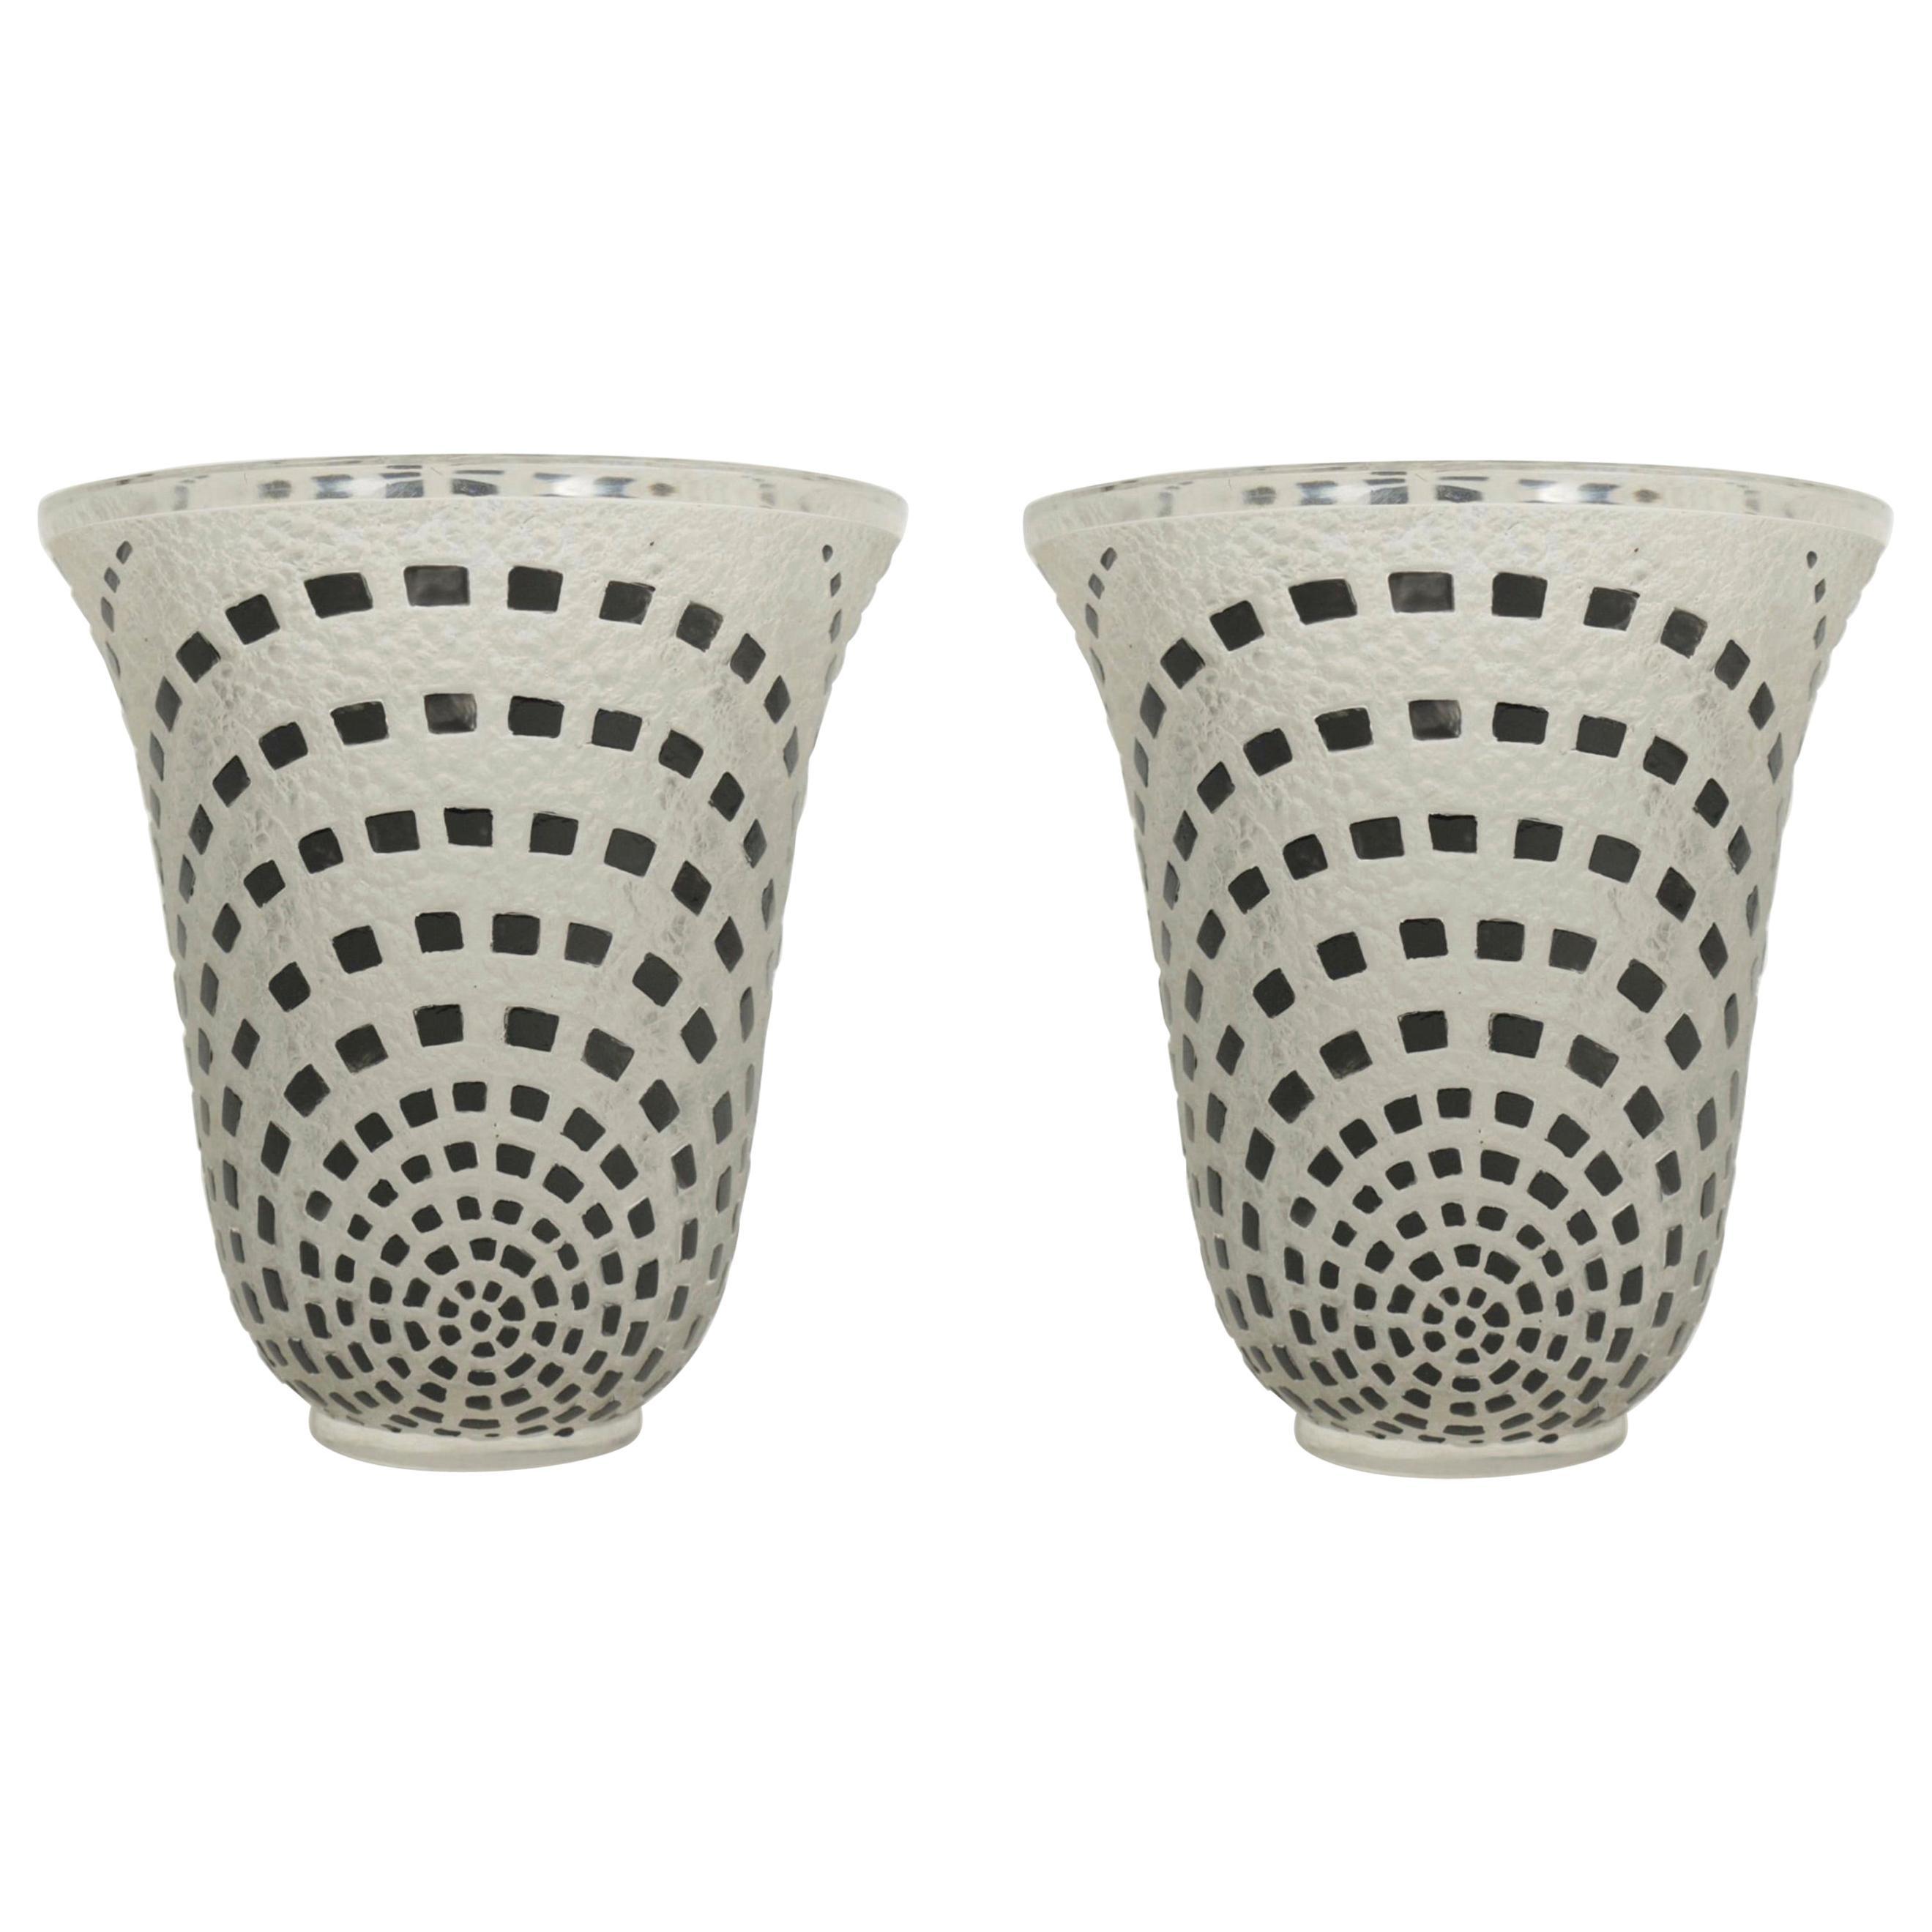 "René Lalique ""Damiers"" Pair of Vases Black Enameled"